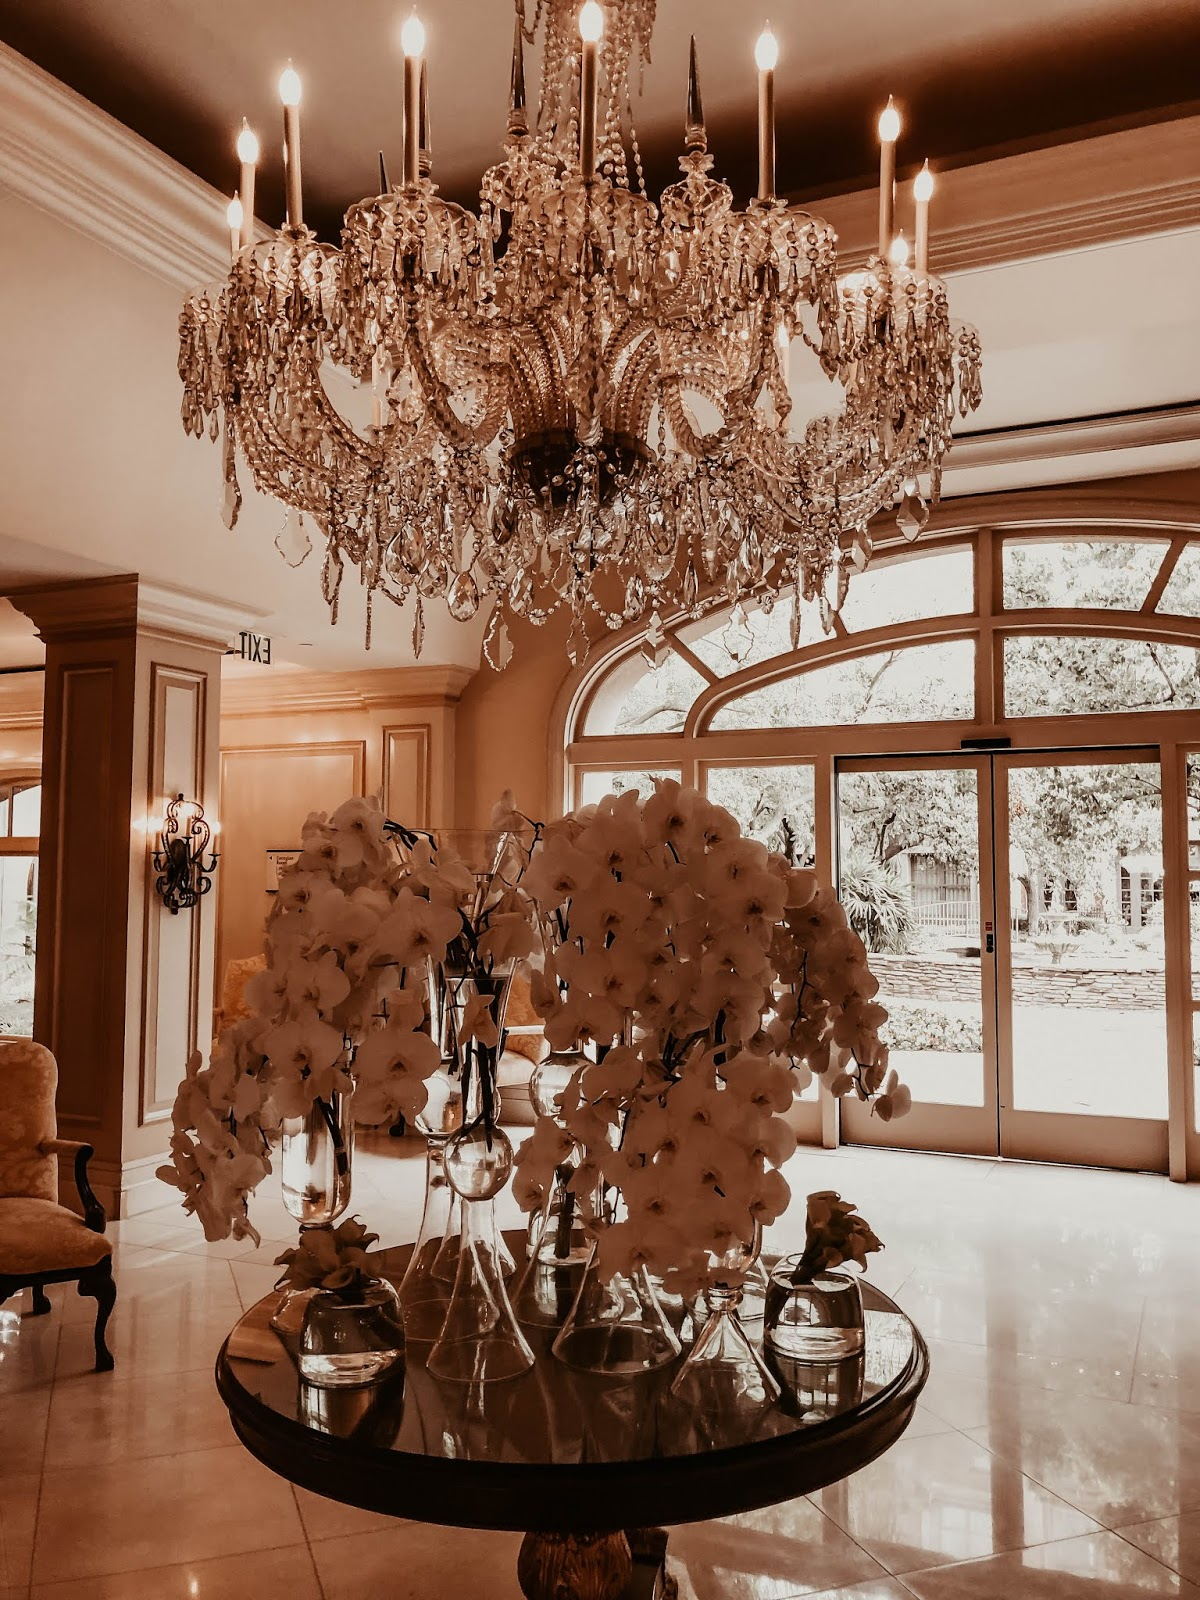 the-most-memorable-end-of-summer2019-getaway-at-the-langham-huntington-hotel-pasadena-california